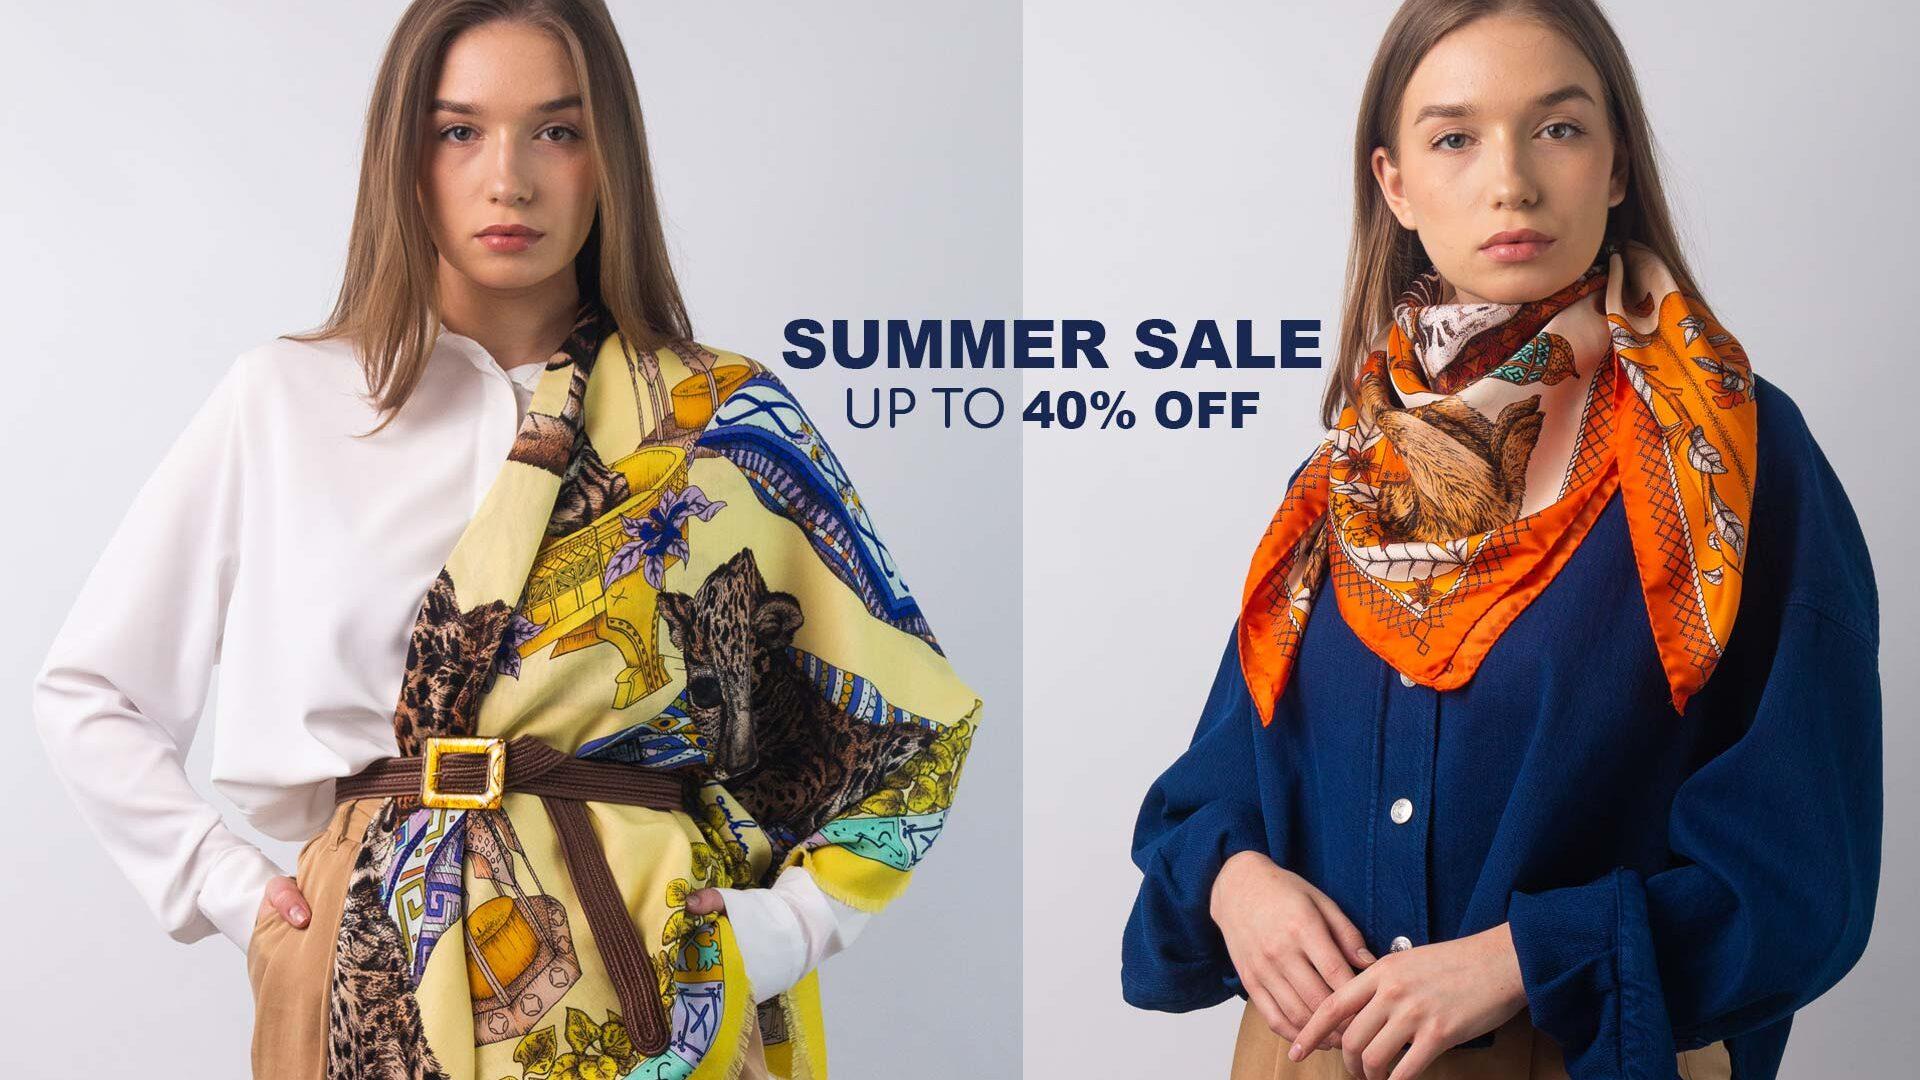 Ilona Tambor Sumer Sale Silk Scarf